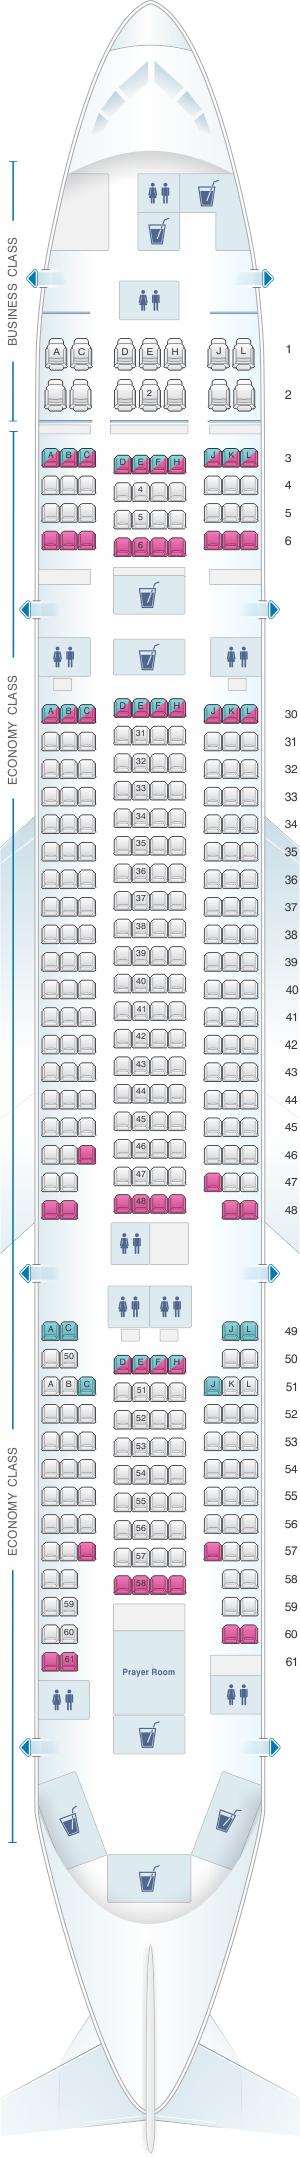 Seat map for Saudi Arabian Airlines Boeing B777 268 (772)